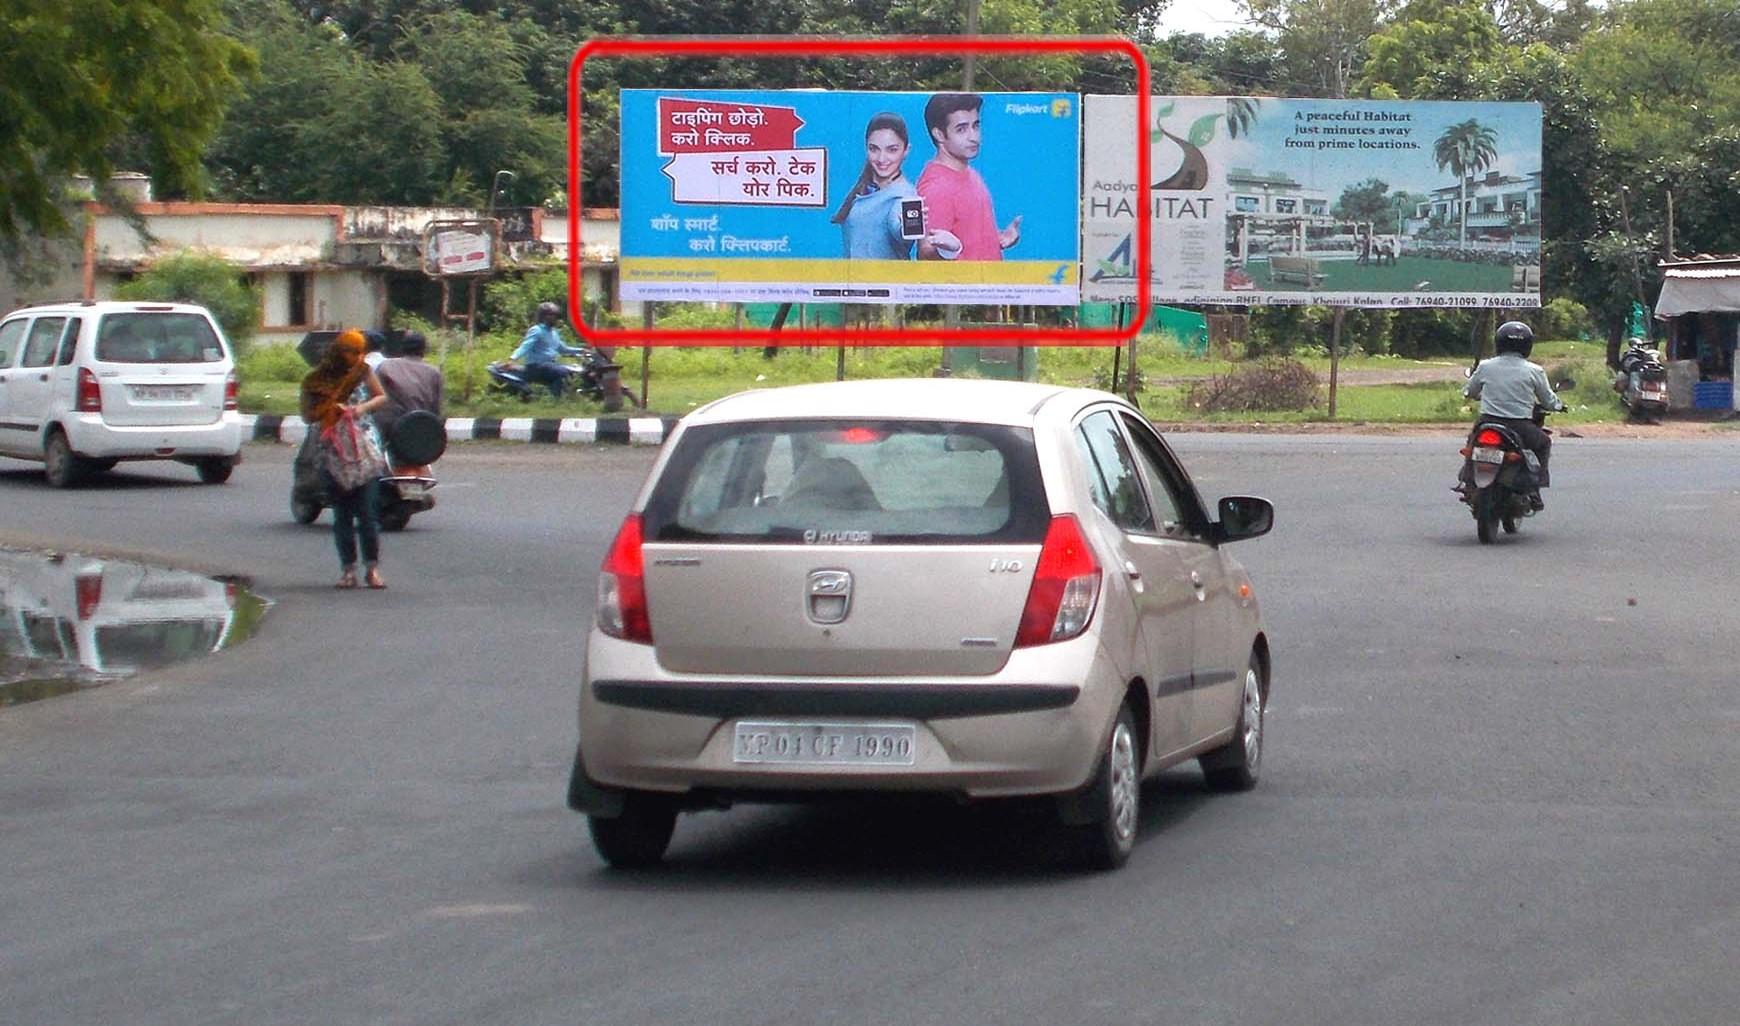 Mahatma Gandhi Square, Bhopal